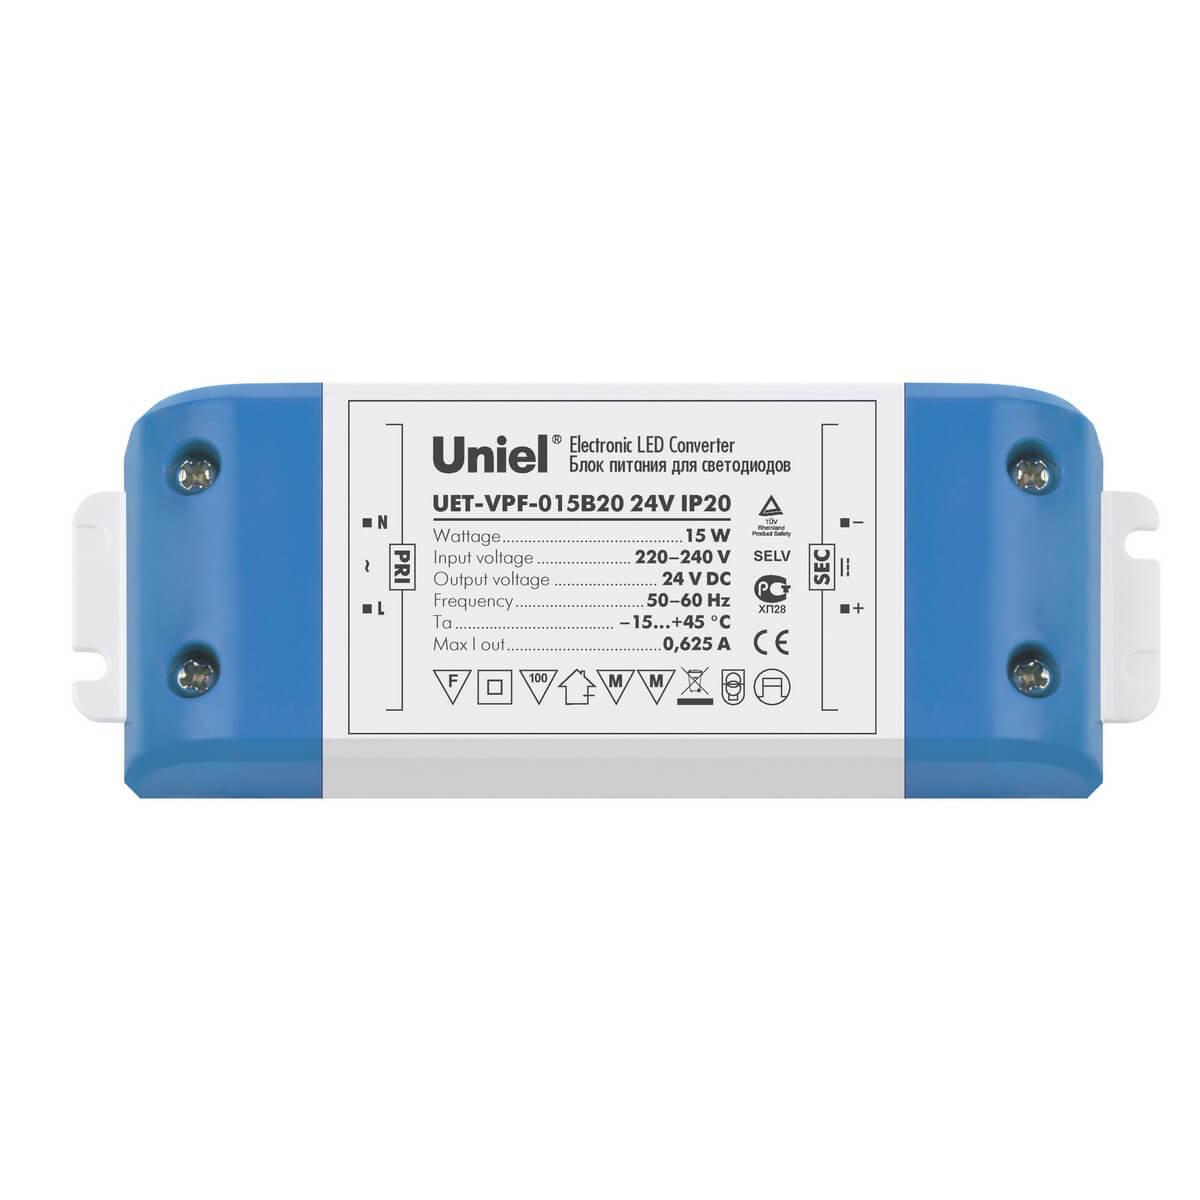 Блок питания для светодиодов 15W 625мА (05831) Uniel UET-VPF-015B20 цены онлайн